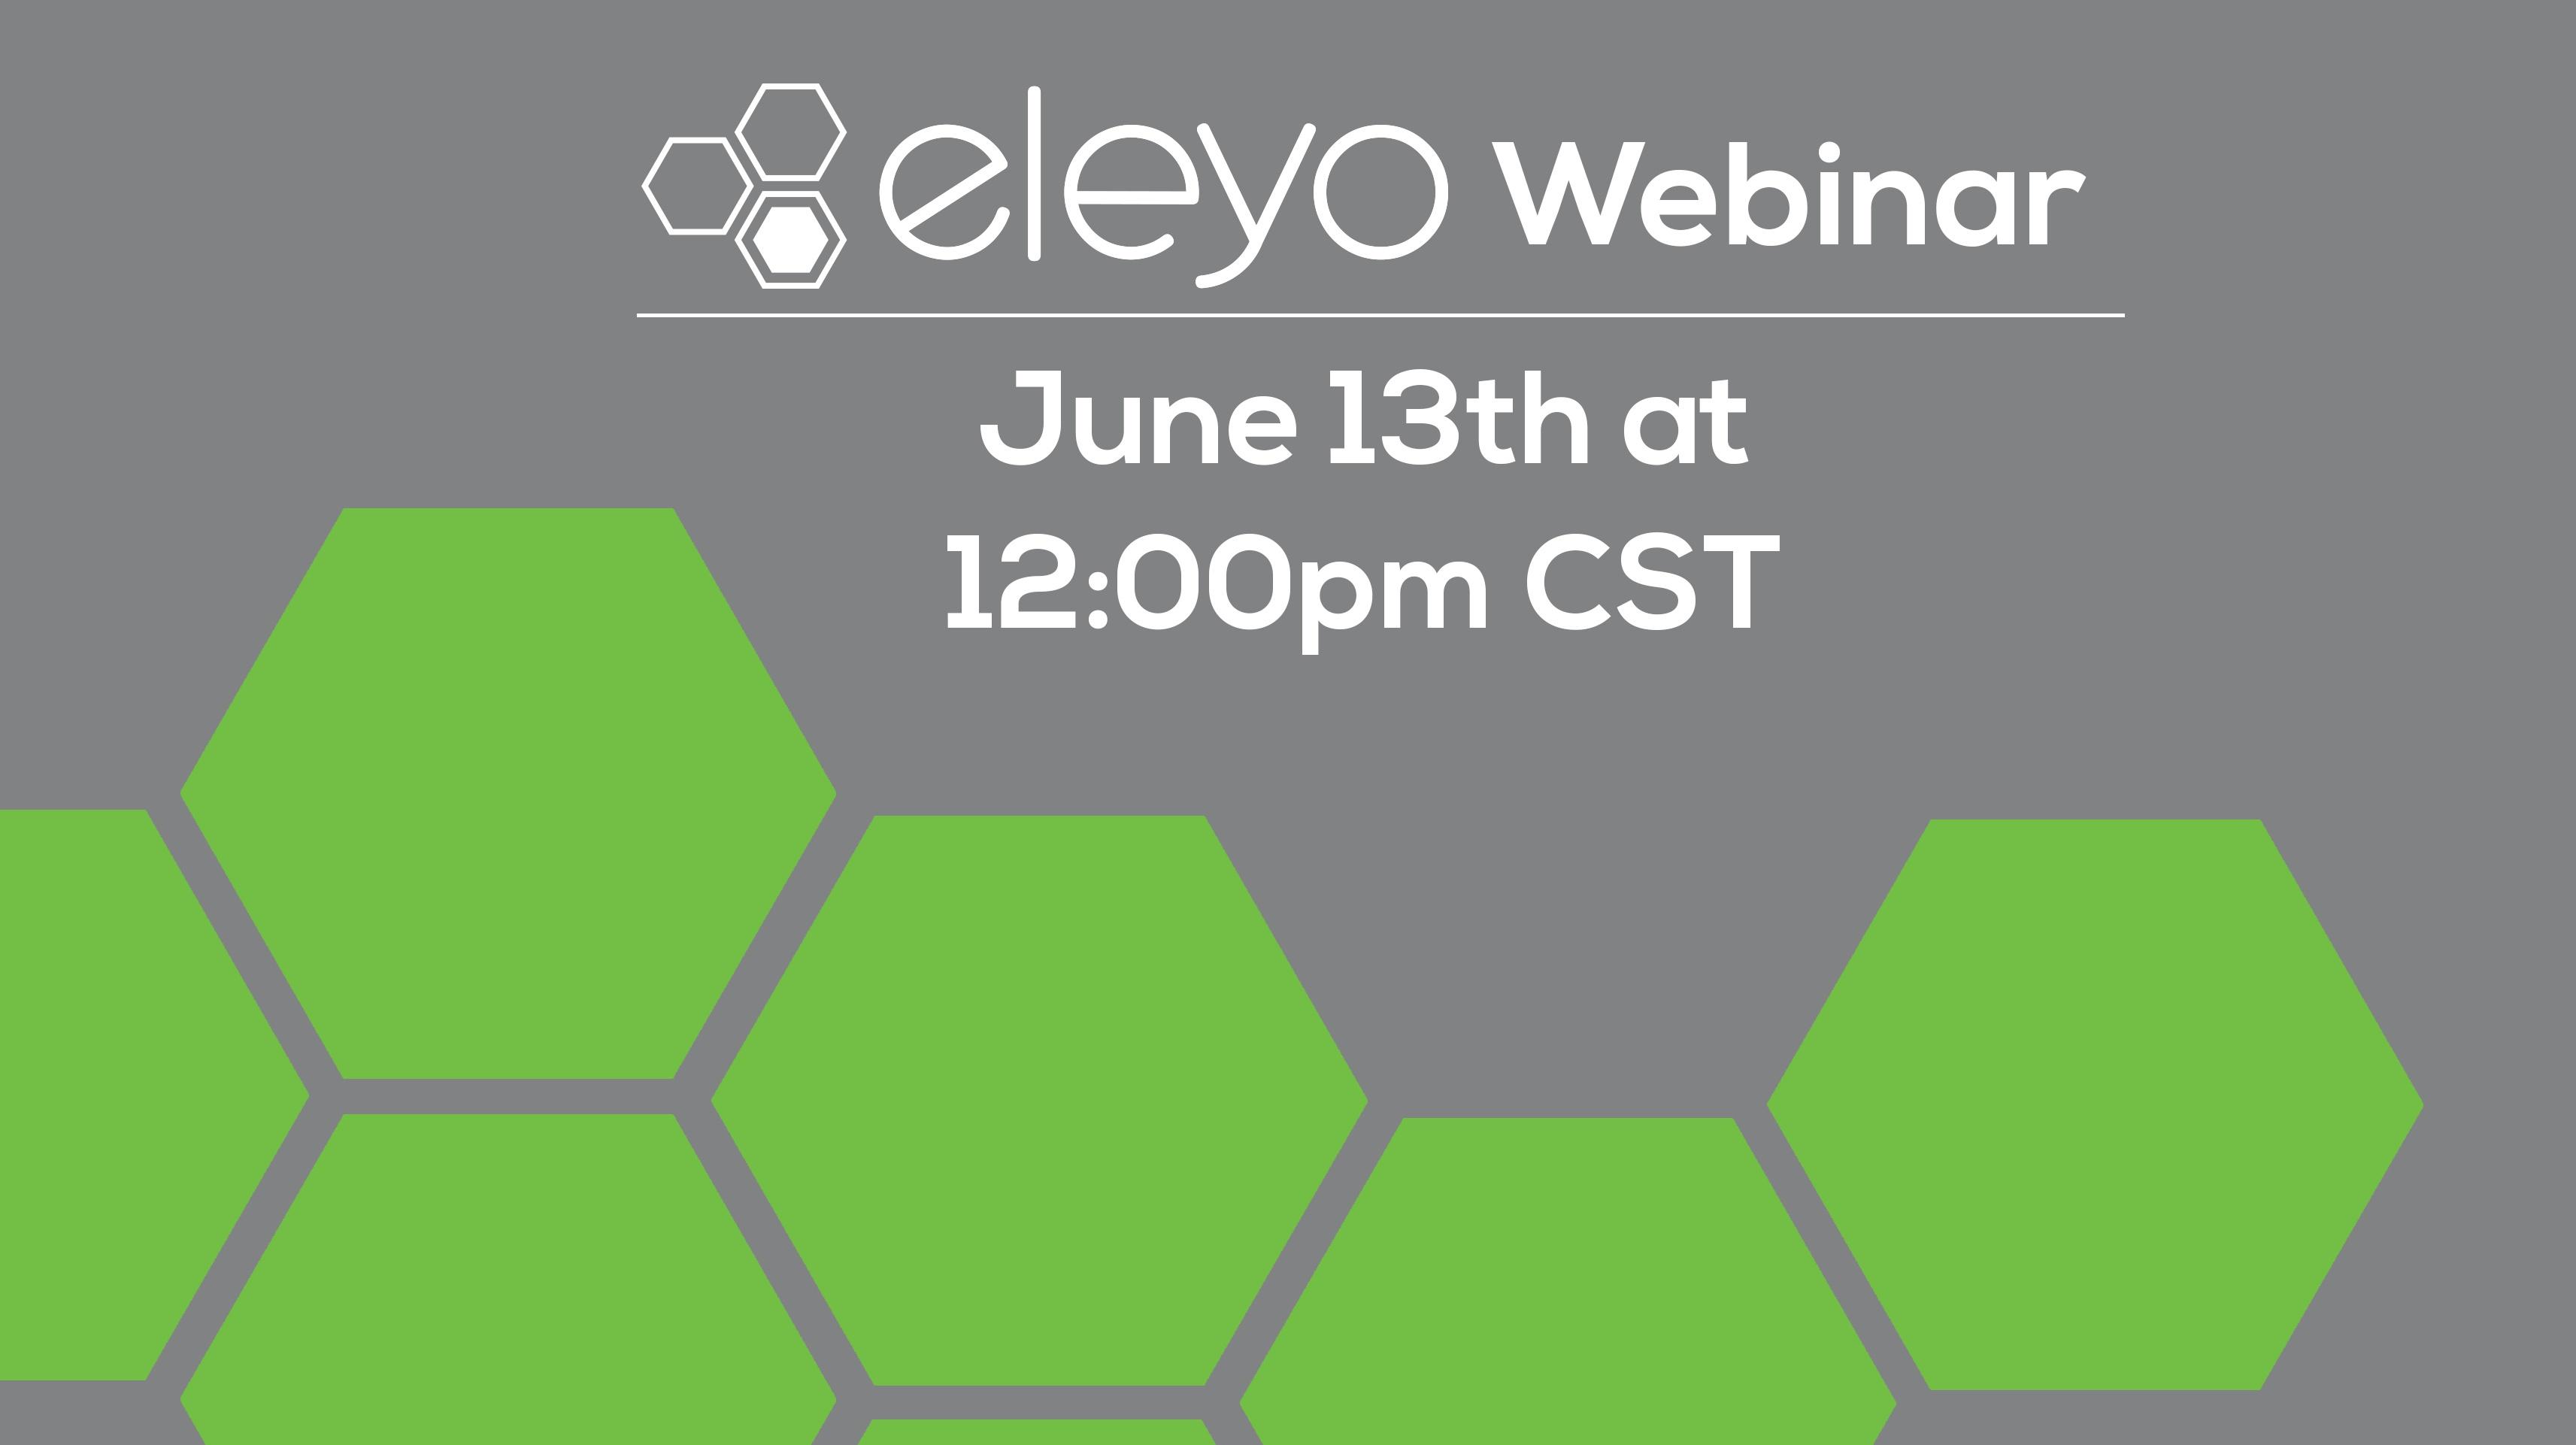 Eleyo: Simplify Program Management June 13th Webinar